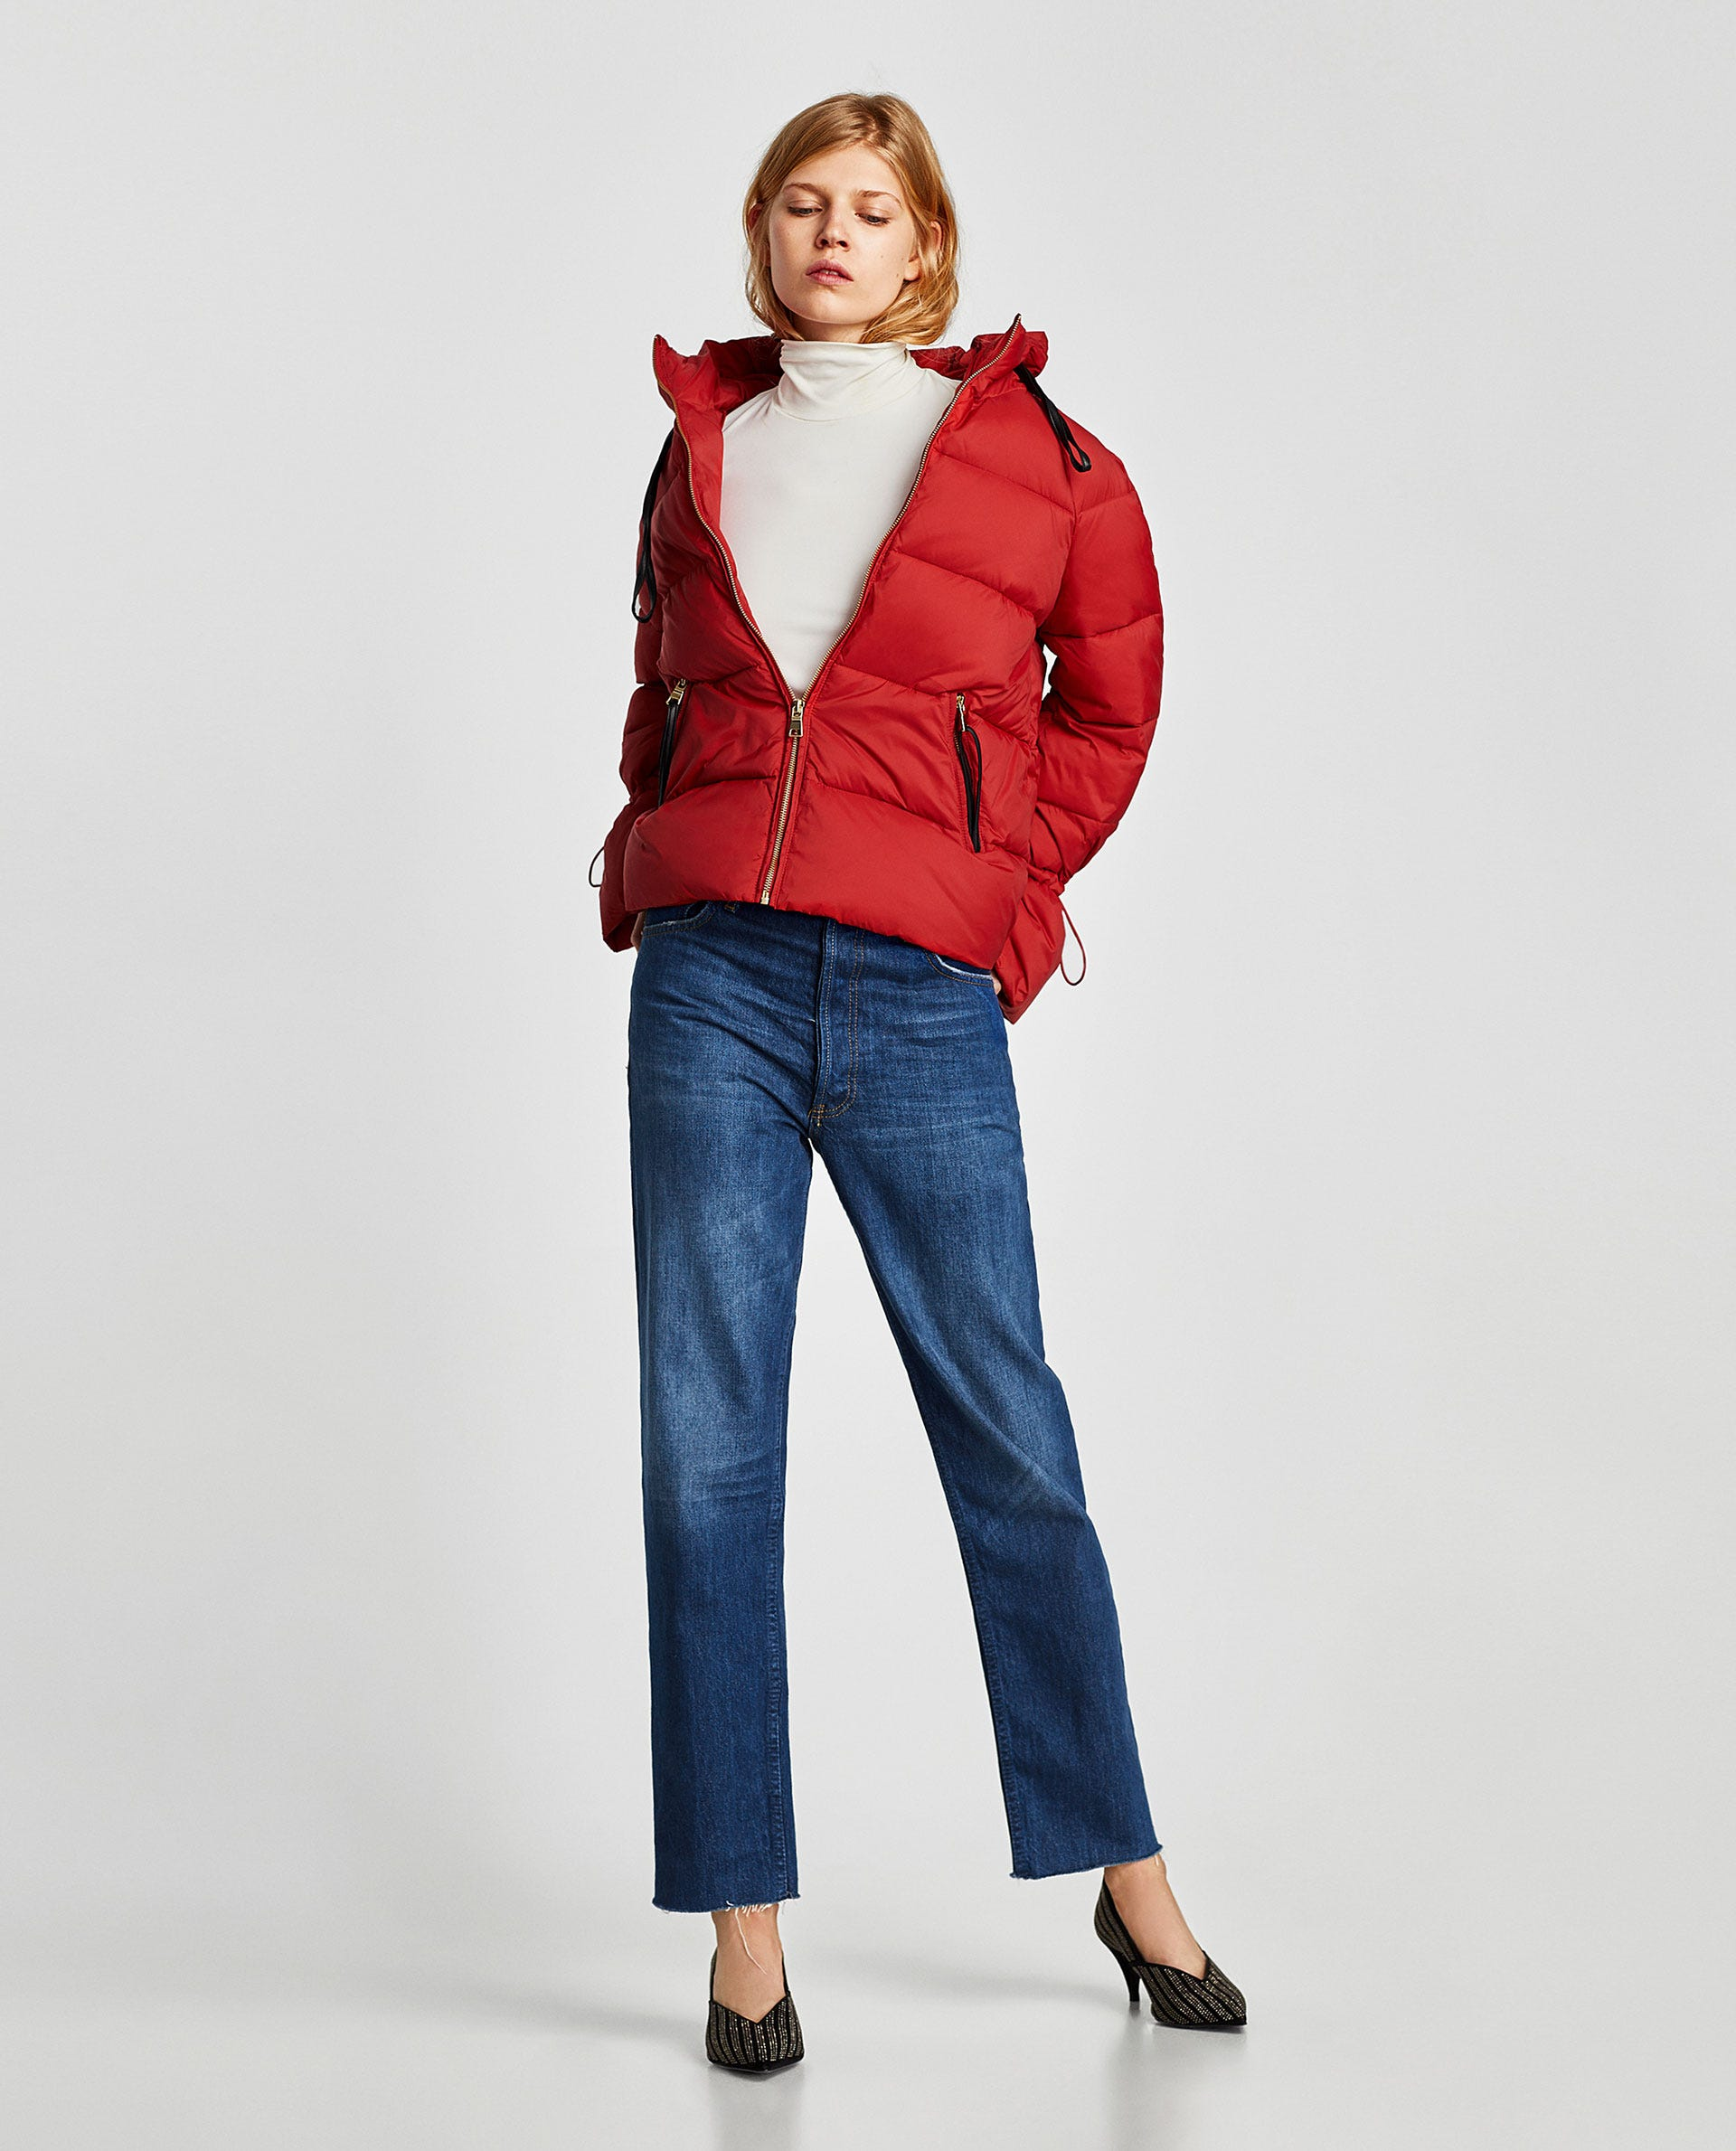 dae70eaf Zara Winter 2017 Best New Puffer Jacket Coats Shop Now